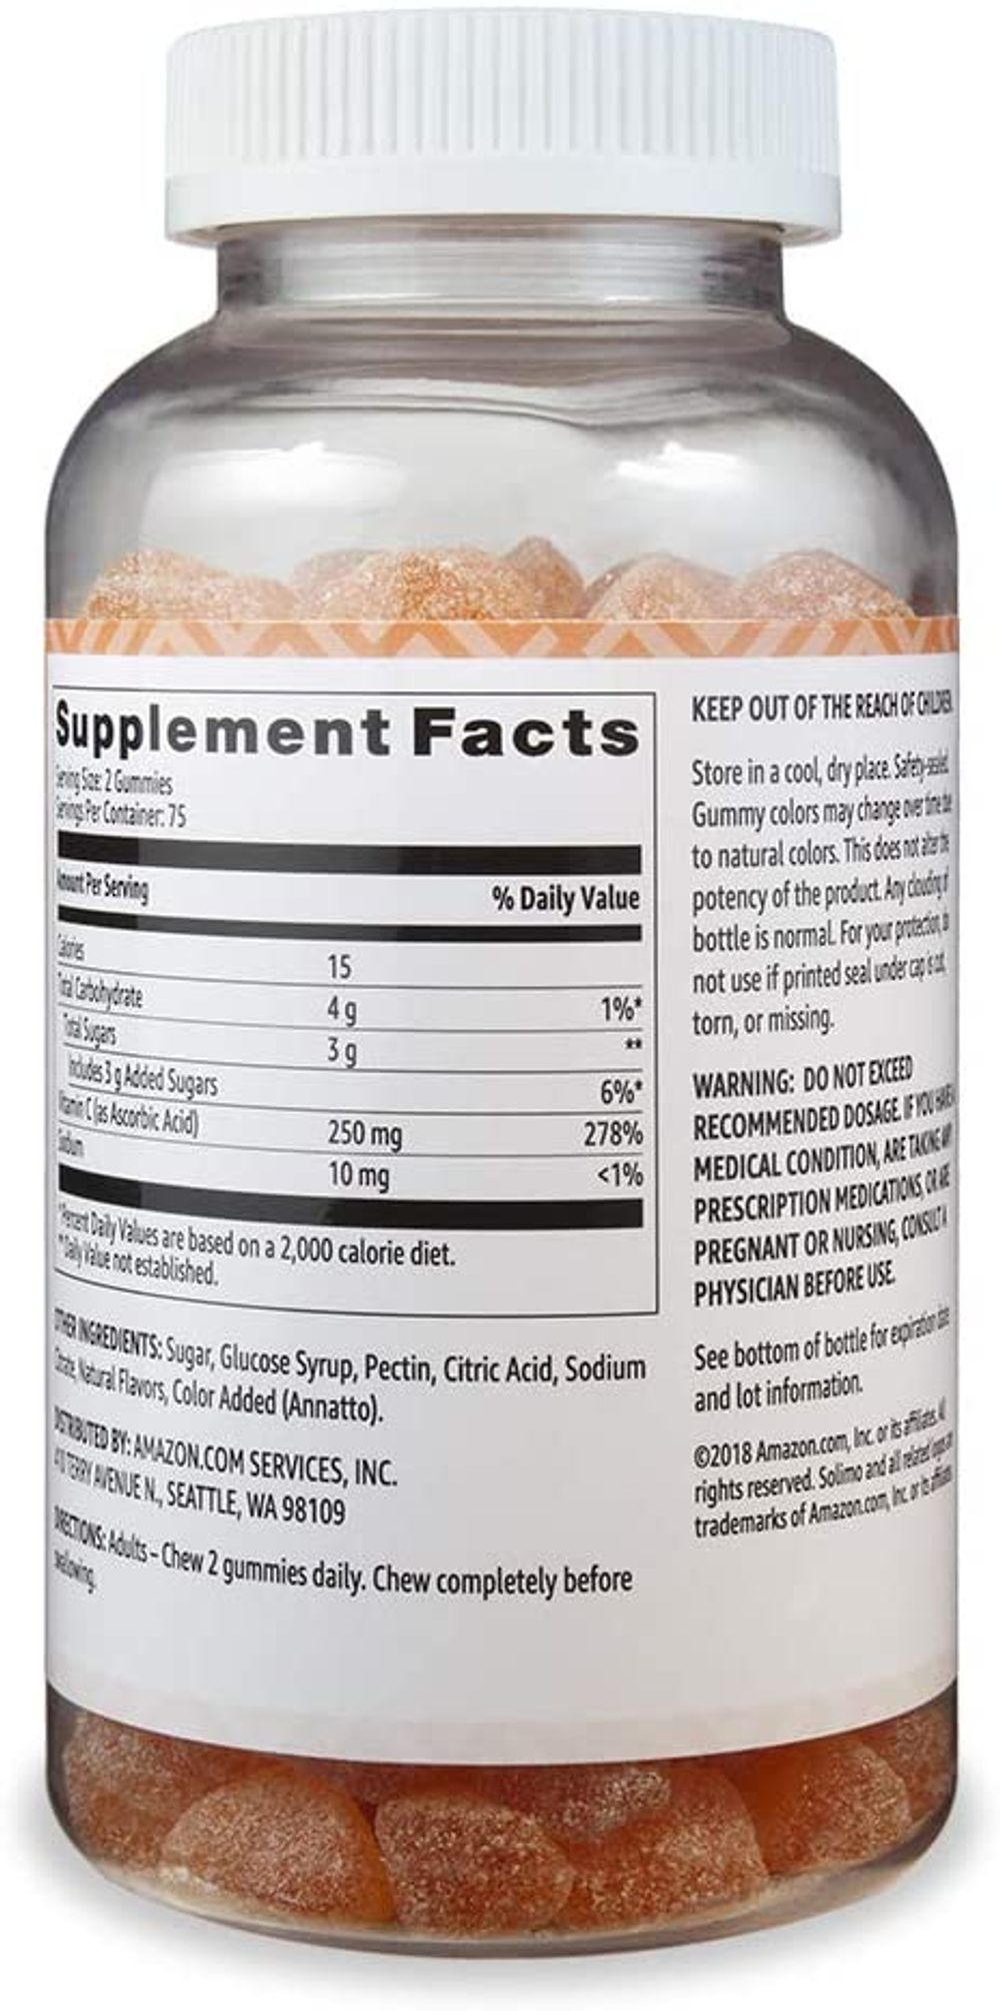 Amazon Brand - Solimo Vitamin C 250mg, 150 Gummies (2 Gummies per Serving), Immune Health